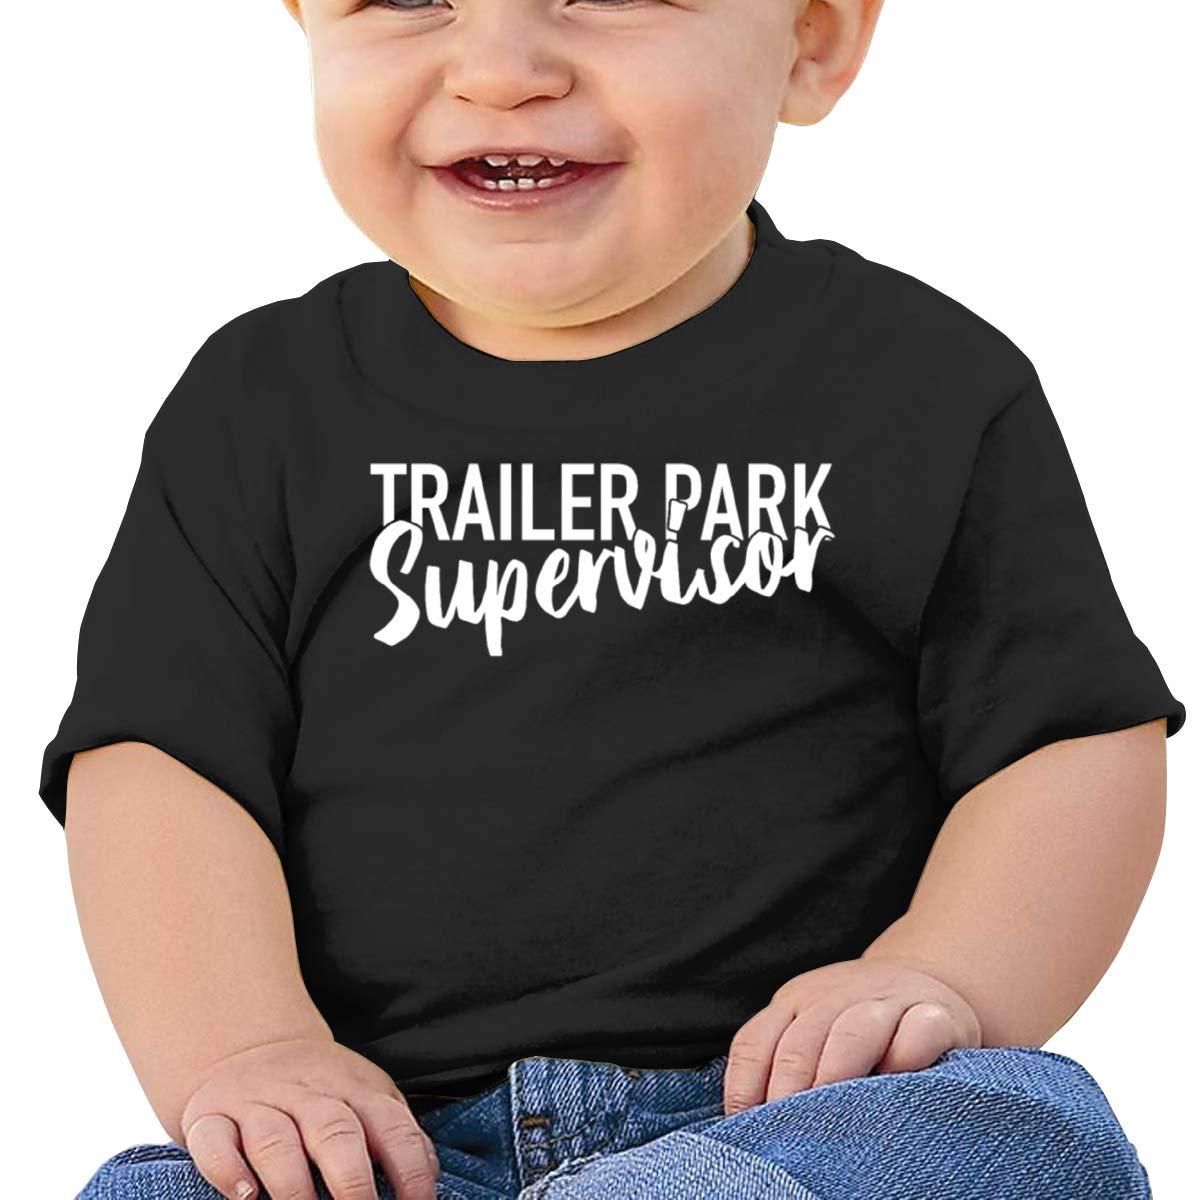 Moniery Trailer Park Supervisor Short Sleeve T Shirts Baby Boy Toddler